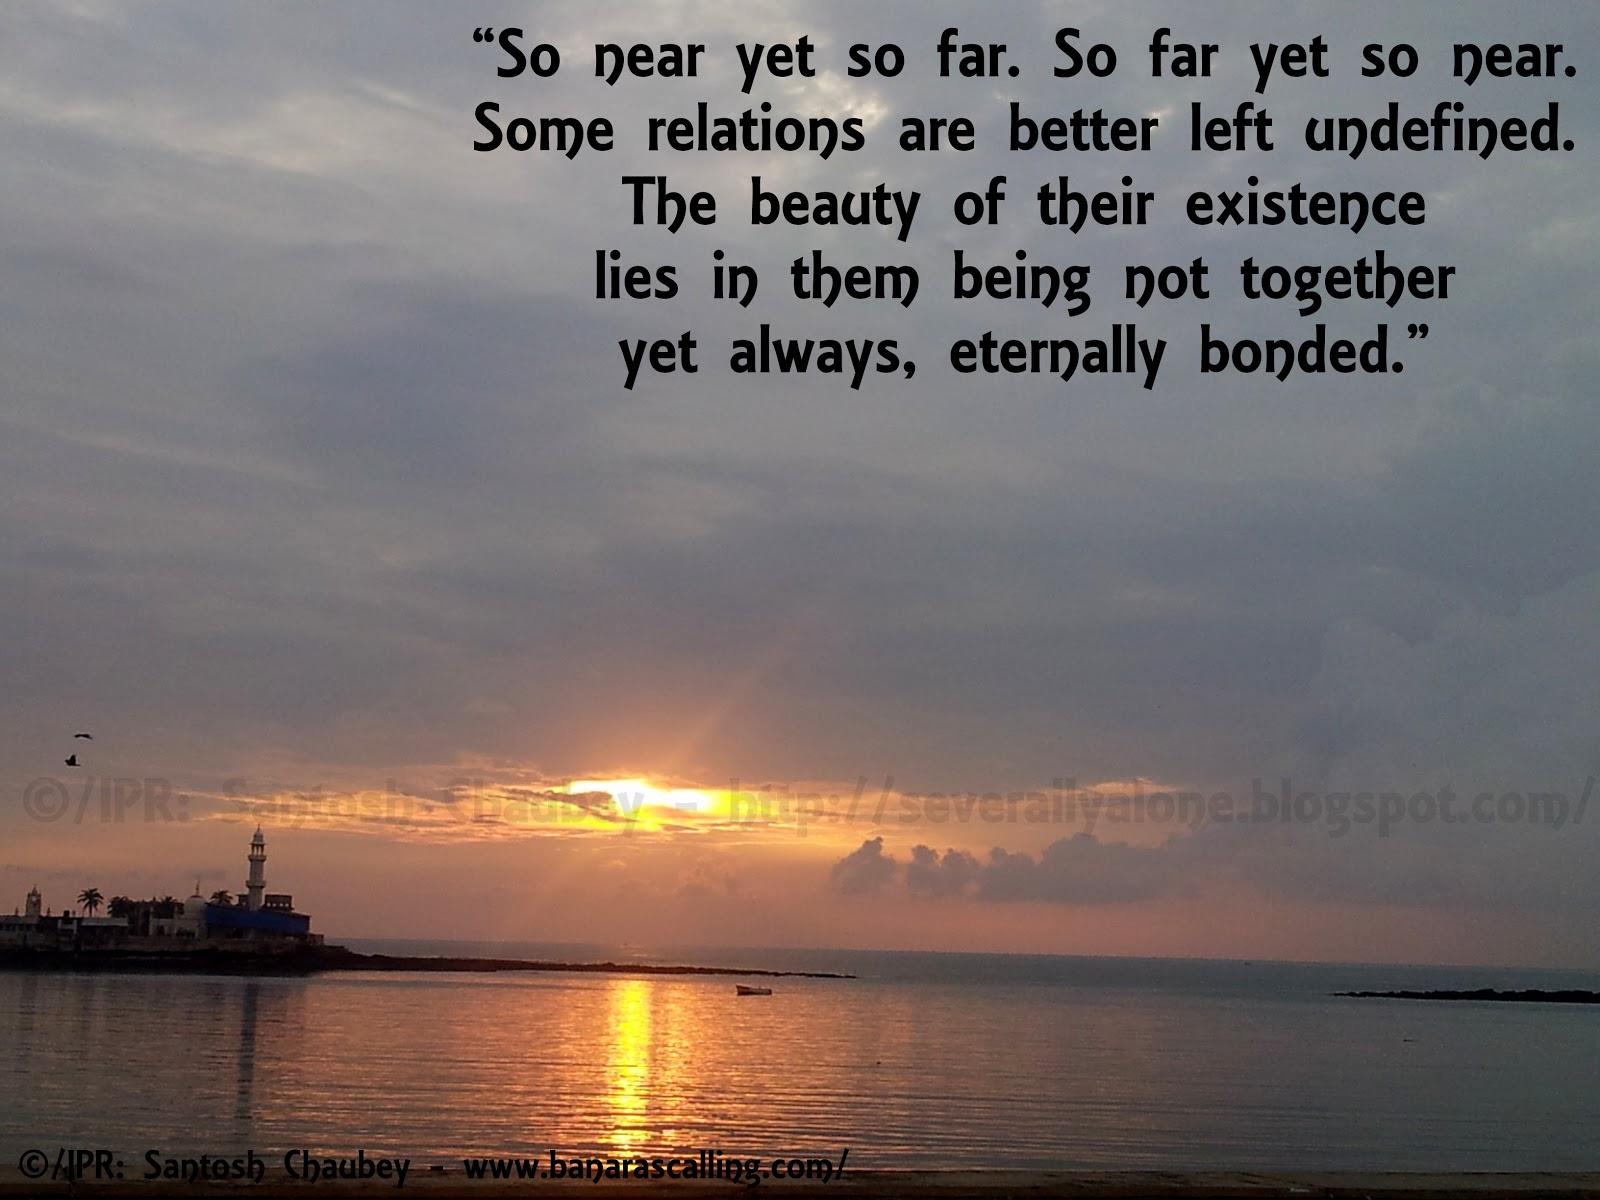 Life & Beyond : SO NEAR YET SO FAR. SO FAR YET SO NEAR.